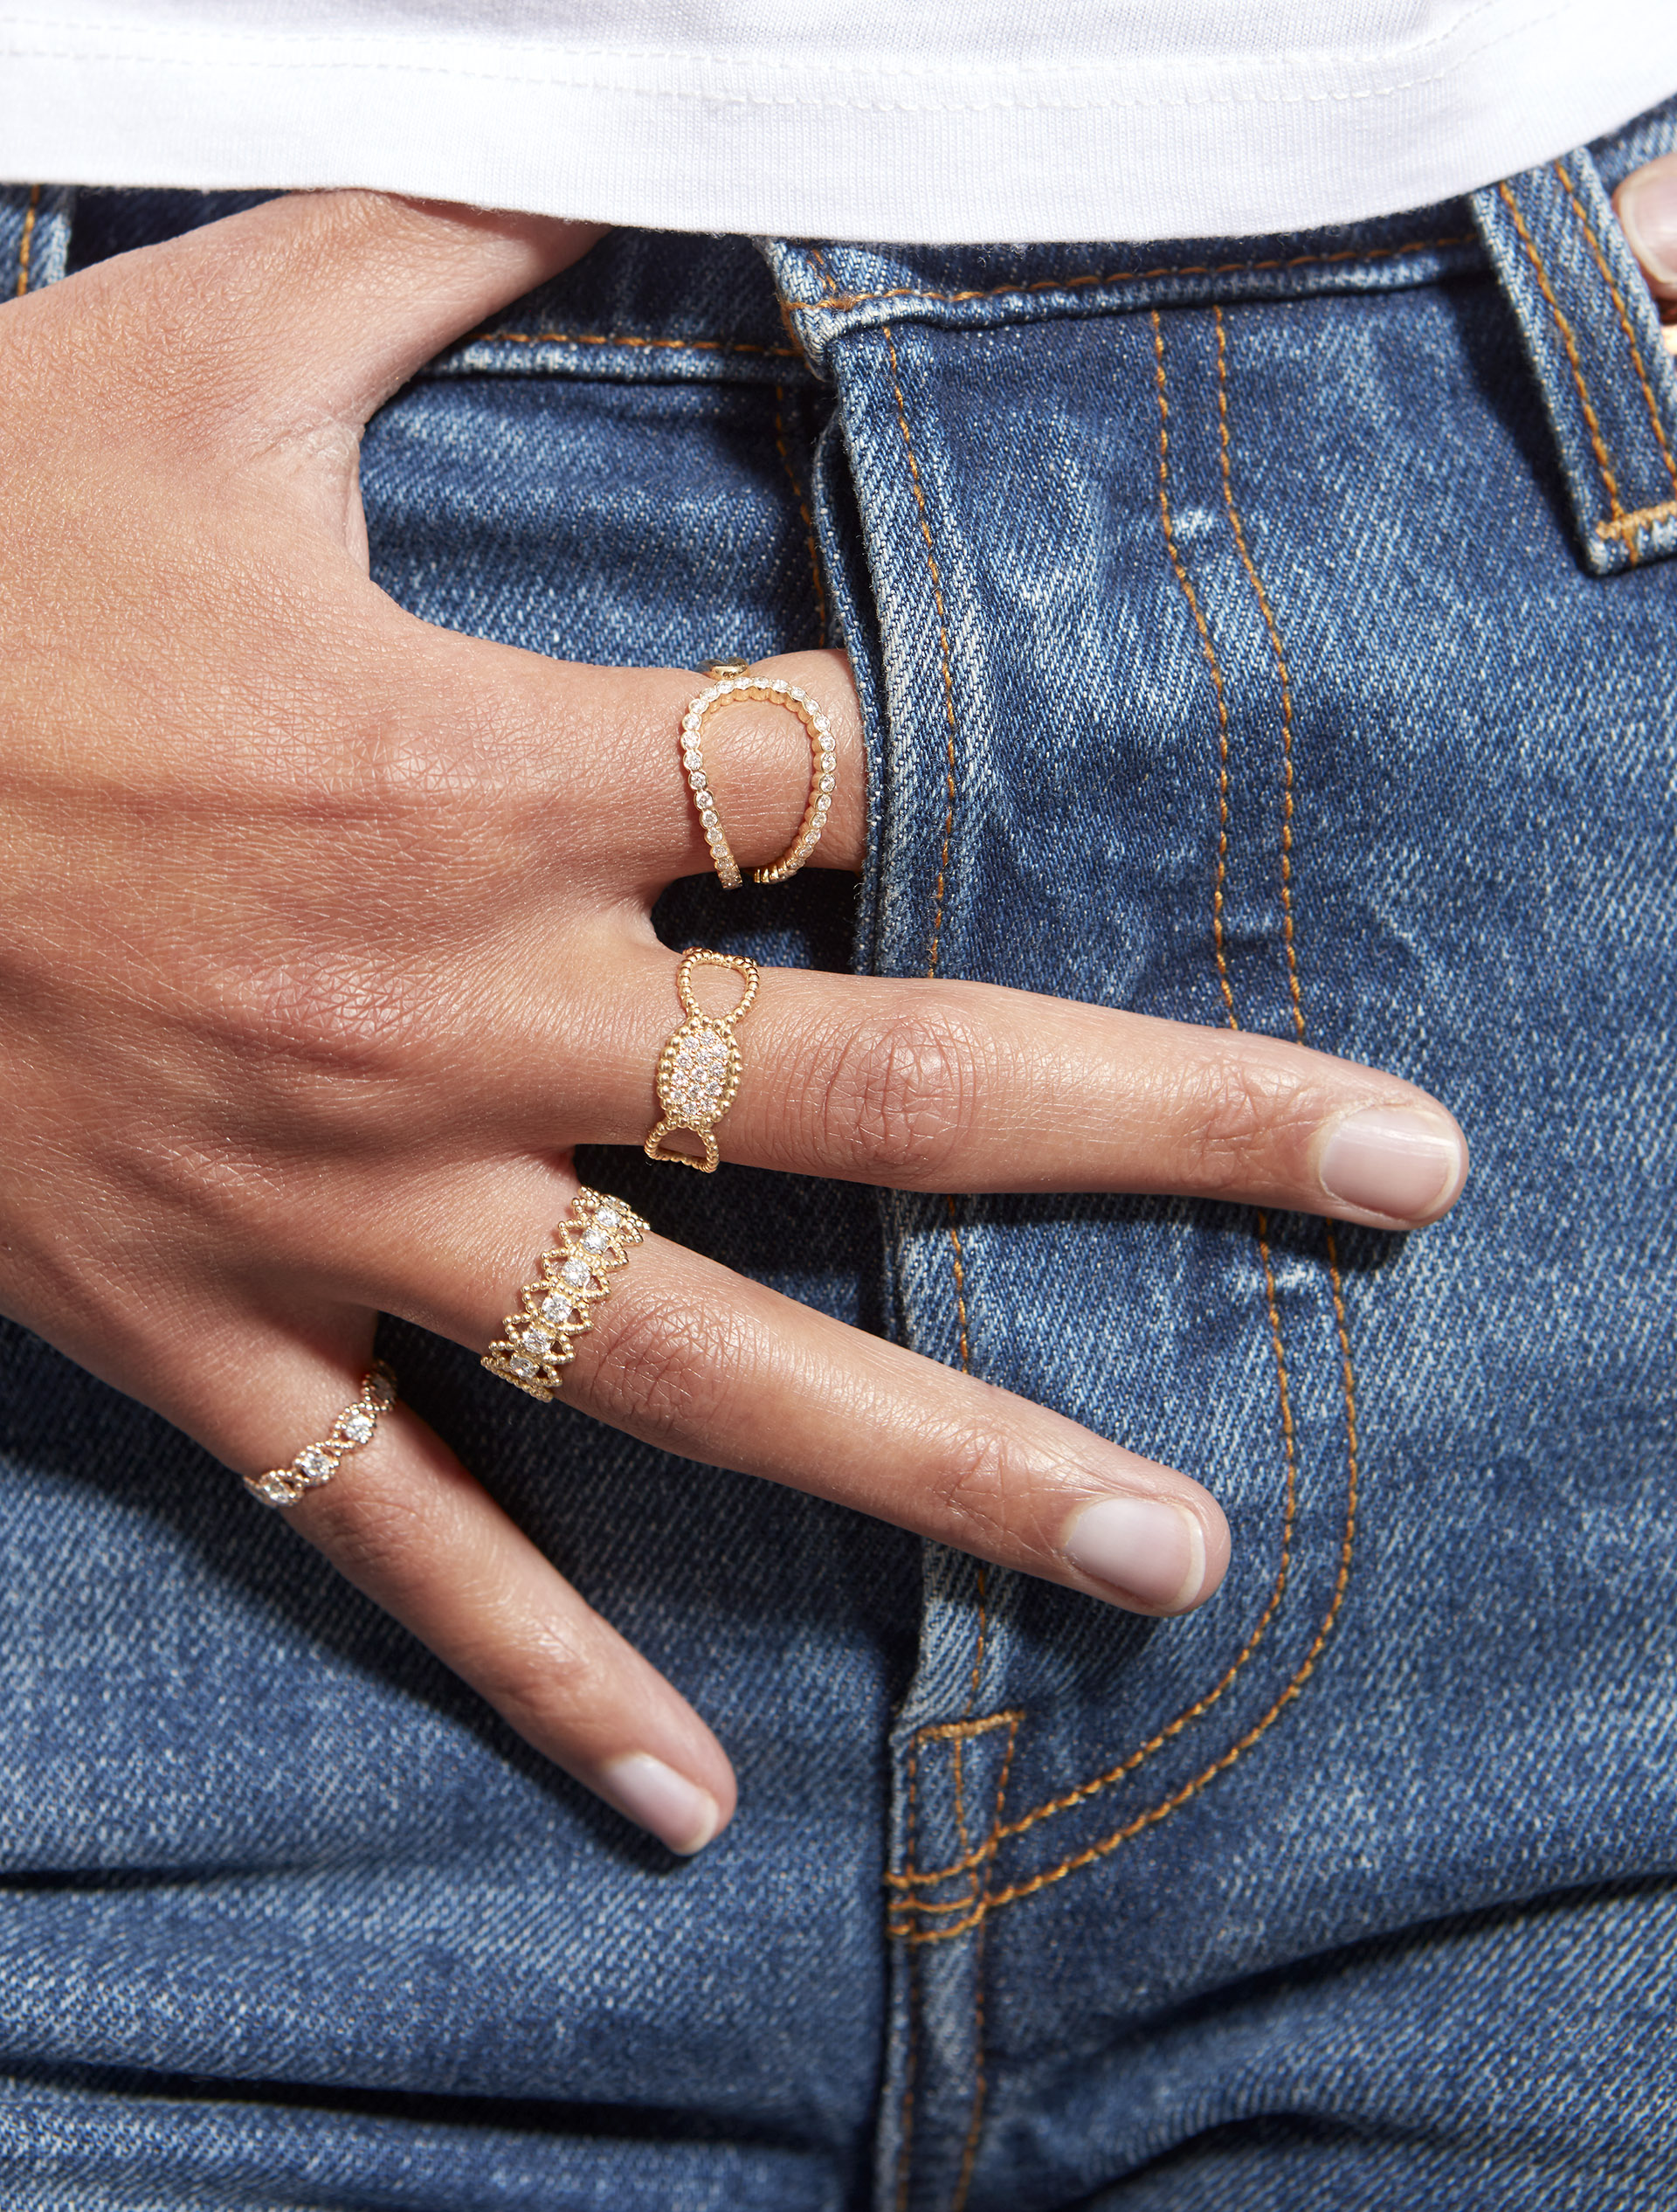 KIMAI FINE JEWELLERY - Ethical and sustainable fine jewellery